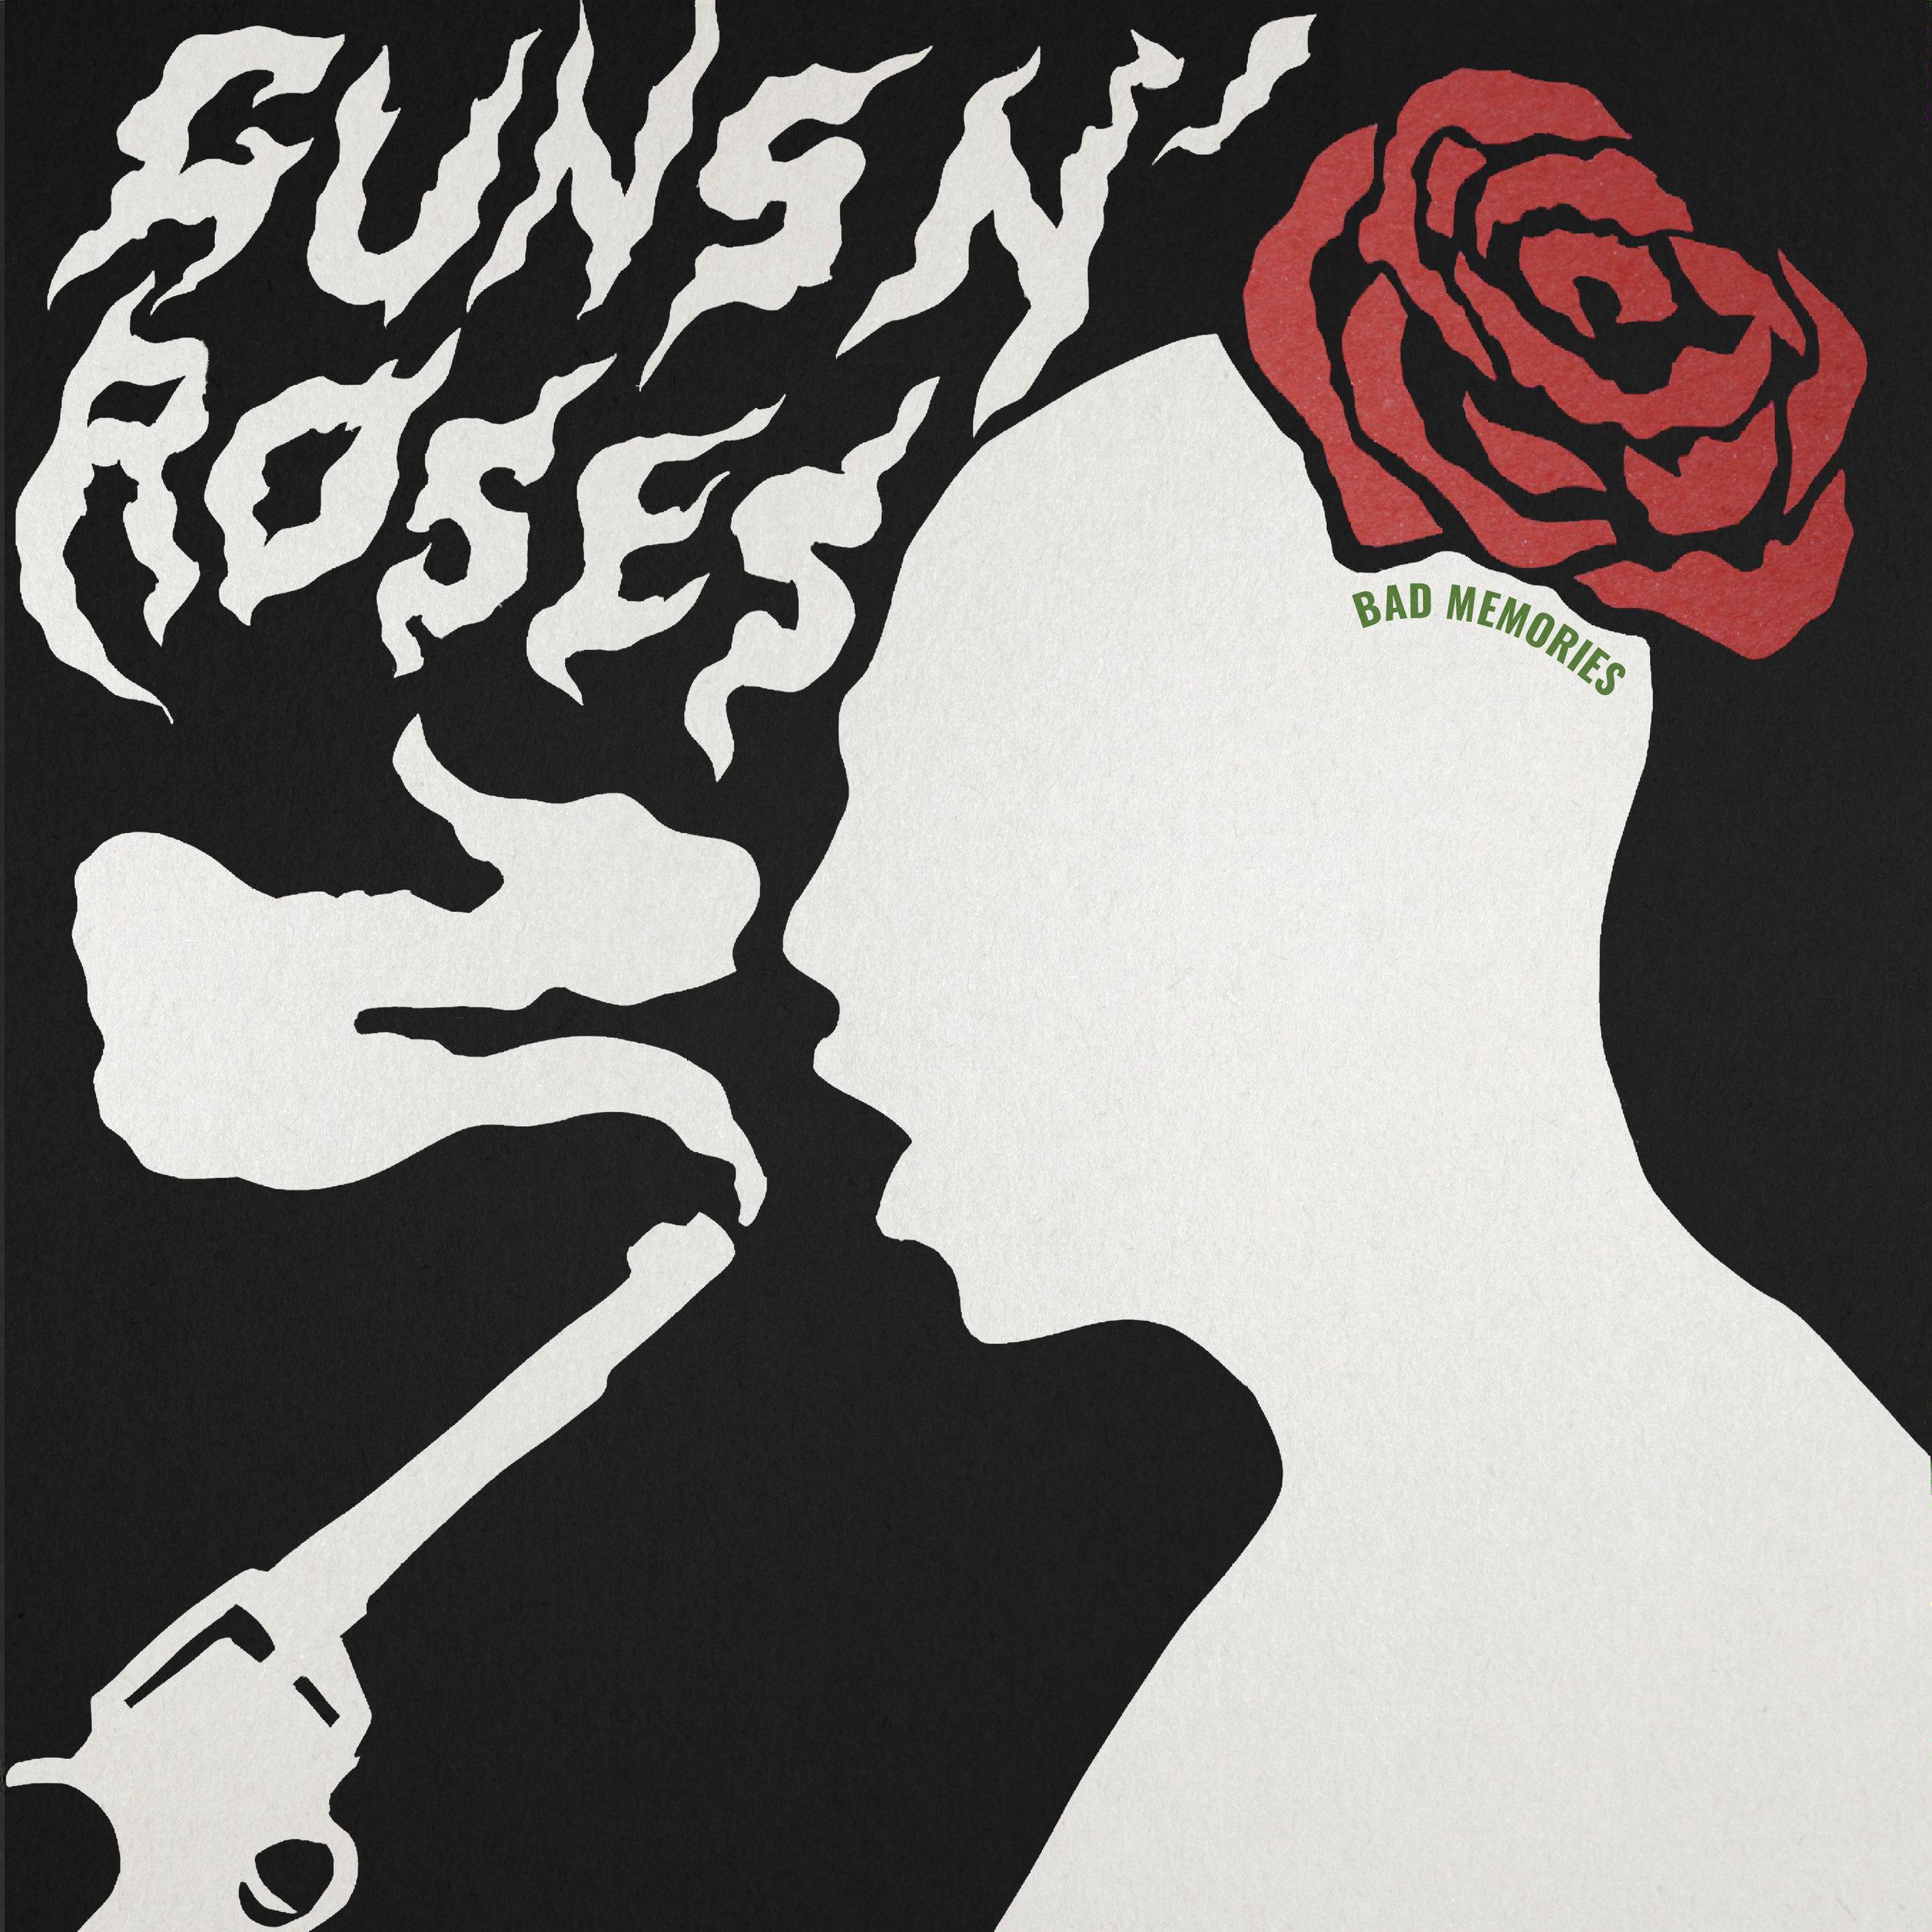 GUNS N ROSES COMPILATION ALBUM COVER